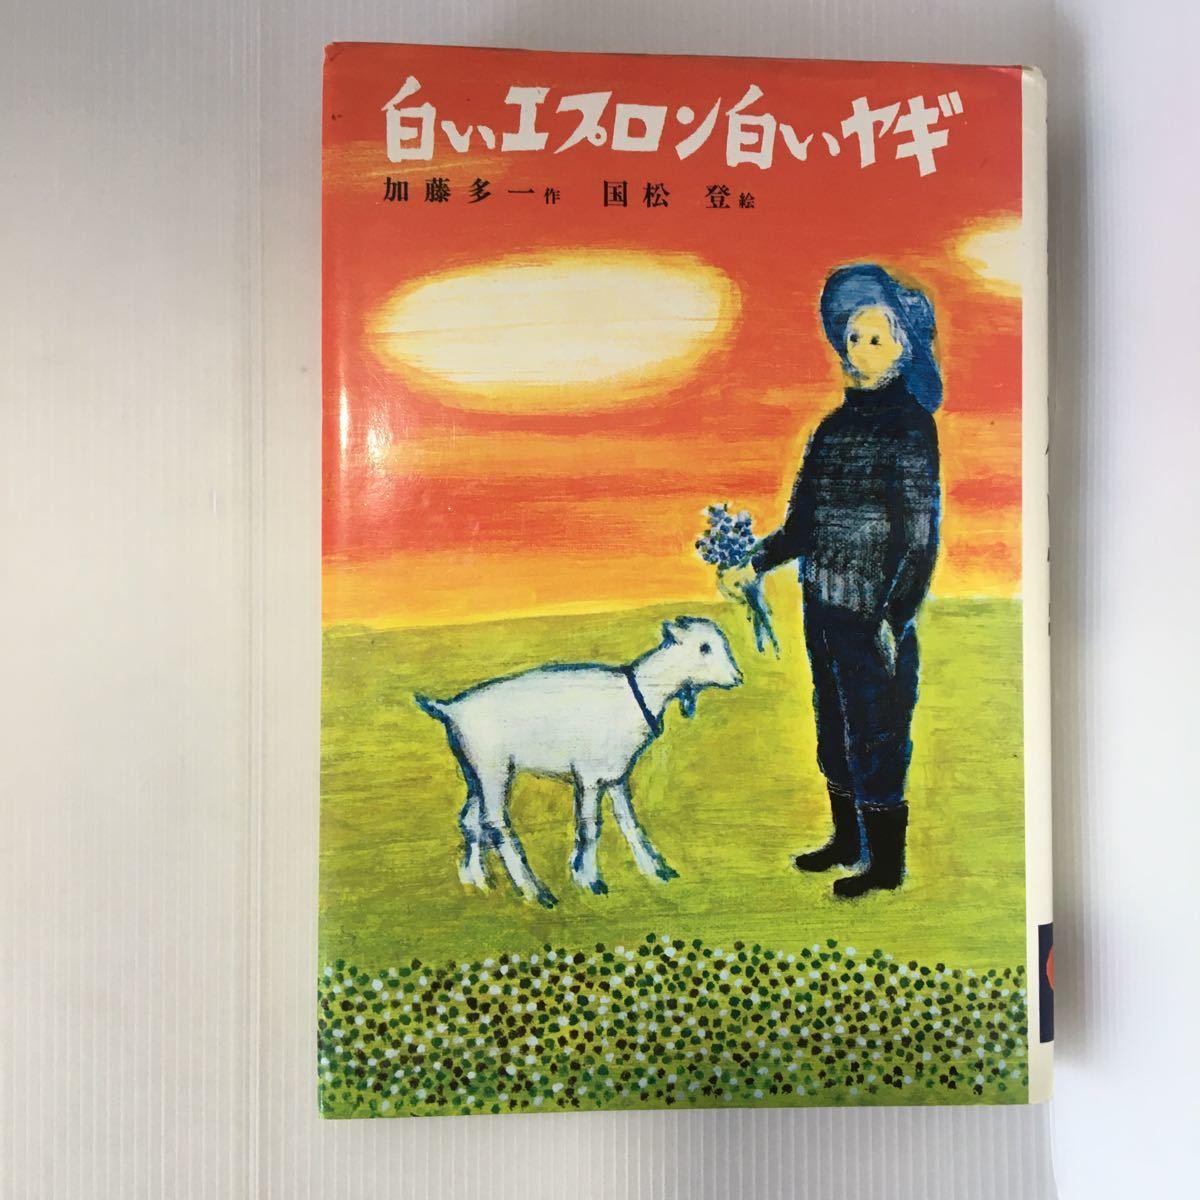 zaa-043★白いエプロン白いヤギ (子どもの文学 10) 単行本 1976/7/1 加藤 多一 (著), 国松 登 (イラスト)